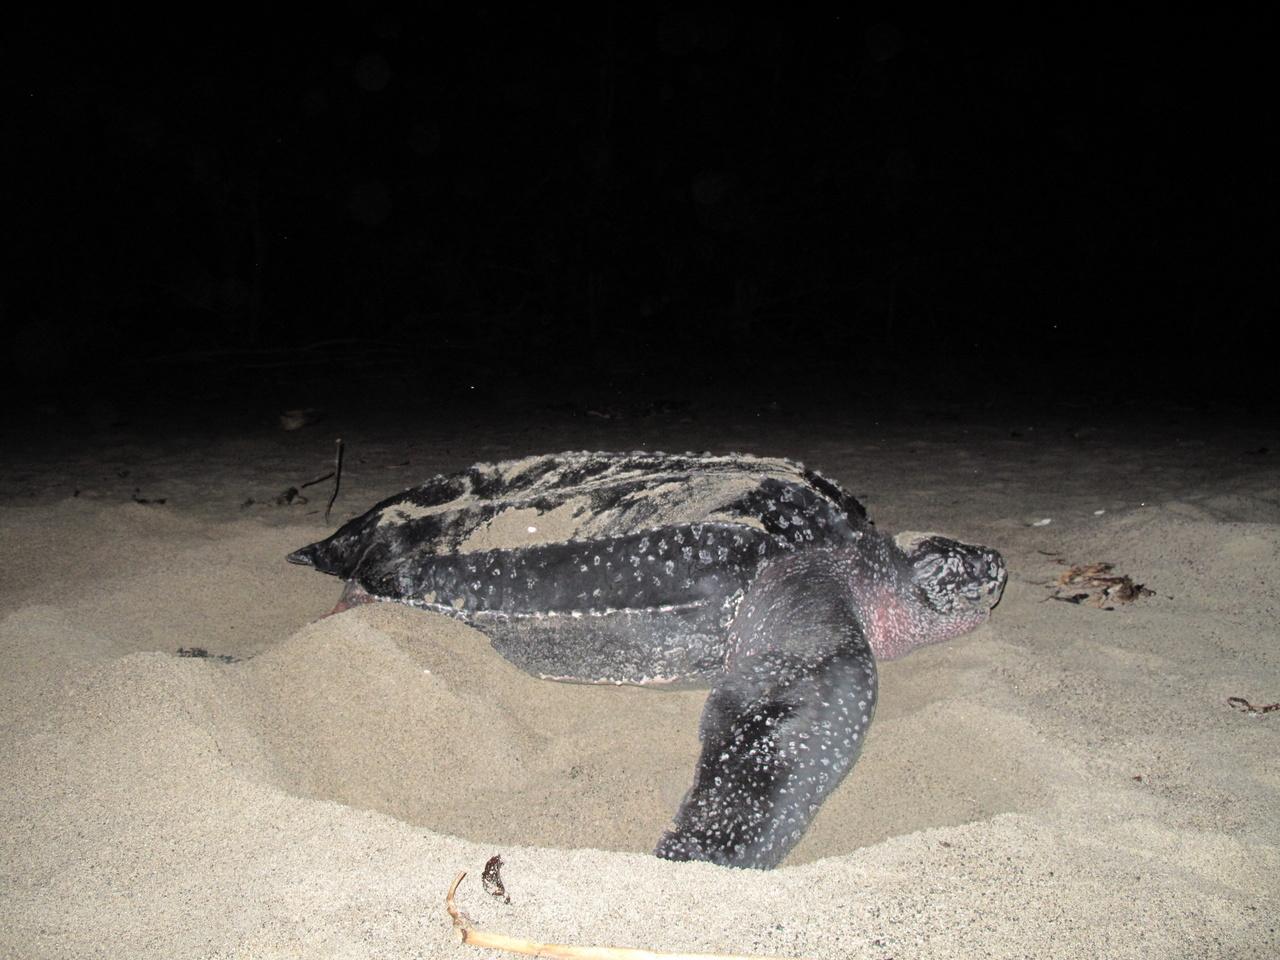 Leatherback turtle nesting in Jamursba-Medi, Papua, Indonesia. Photo: NOAA Fisheries/Manjula Tiwari